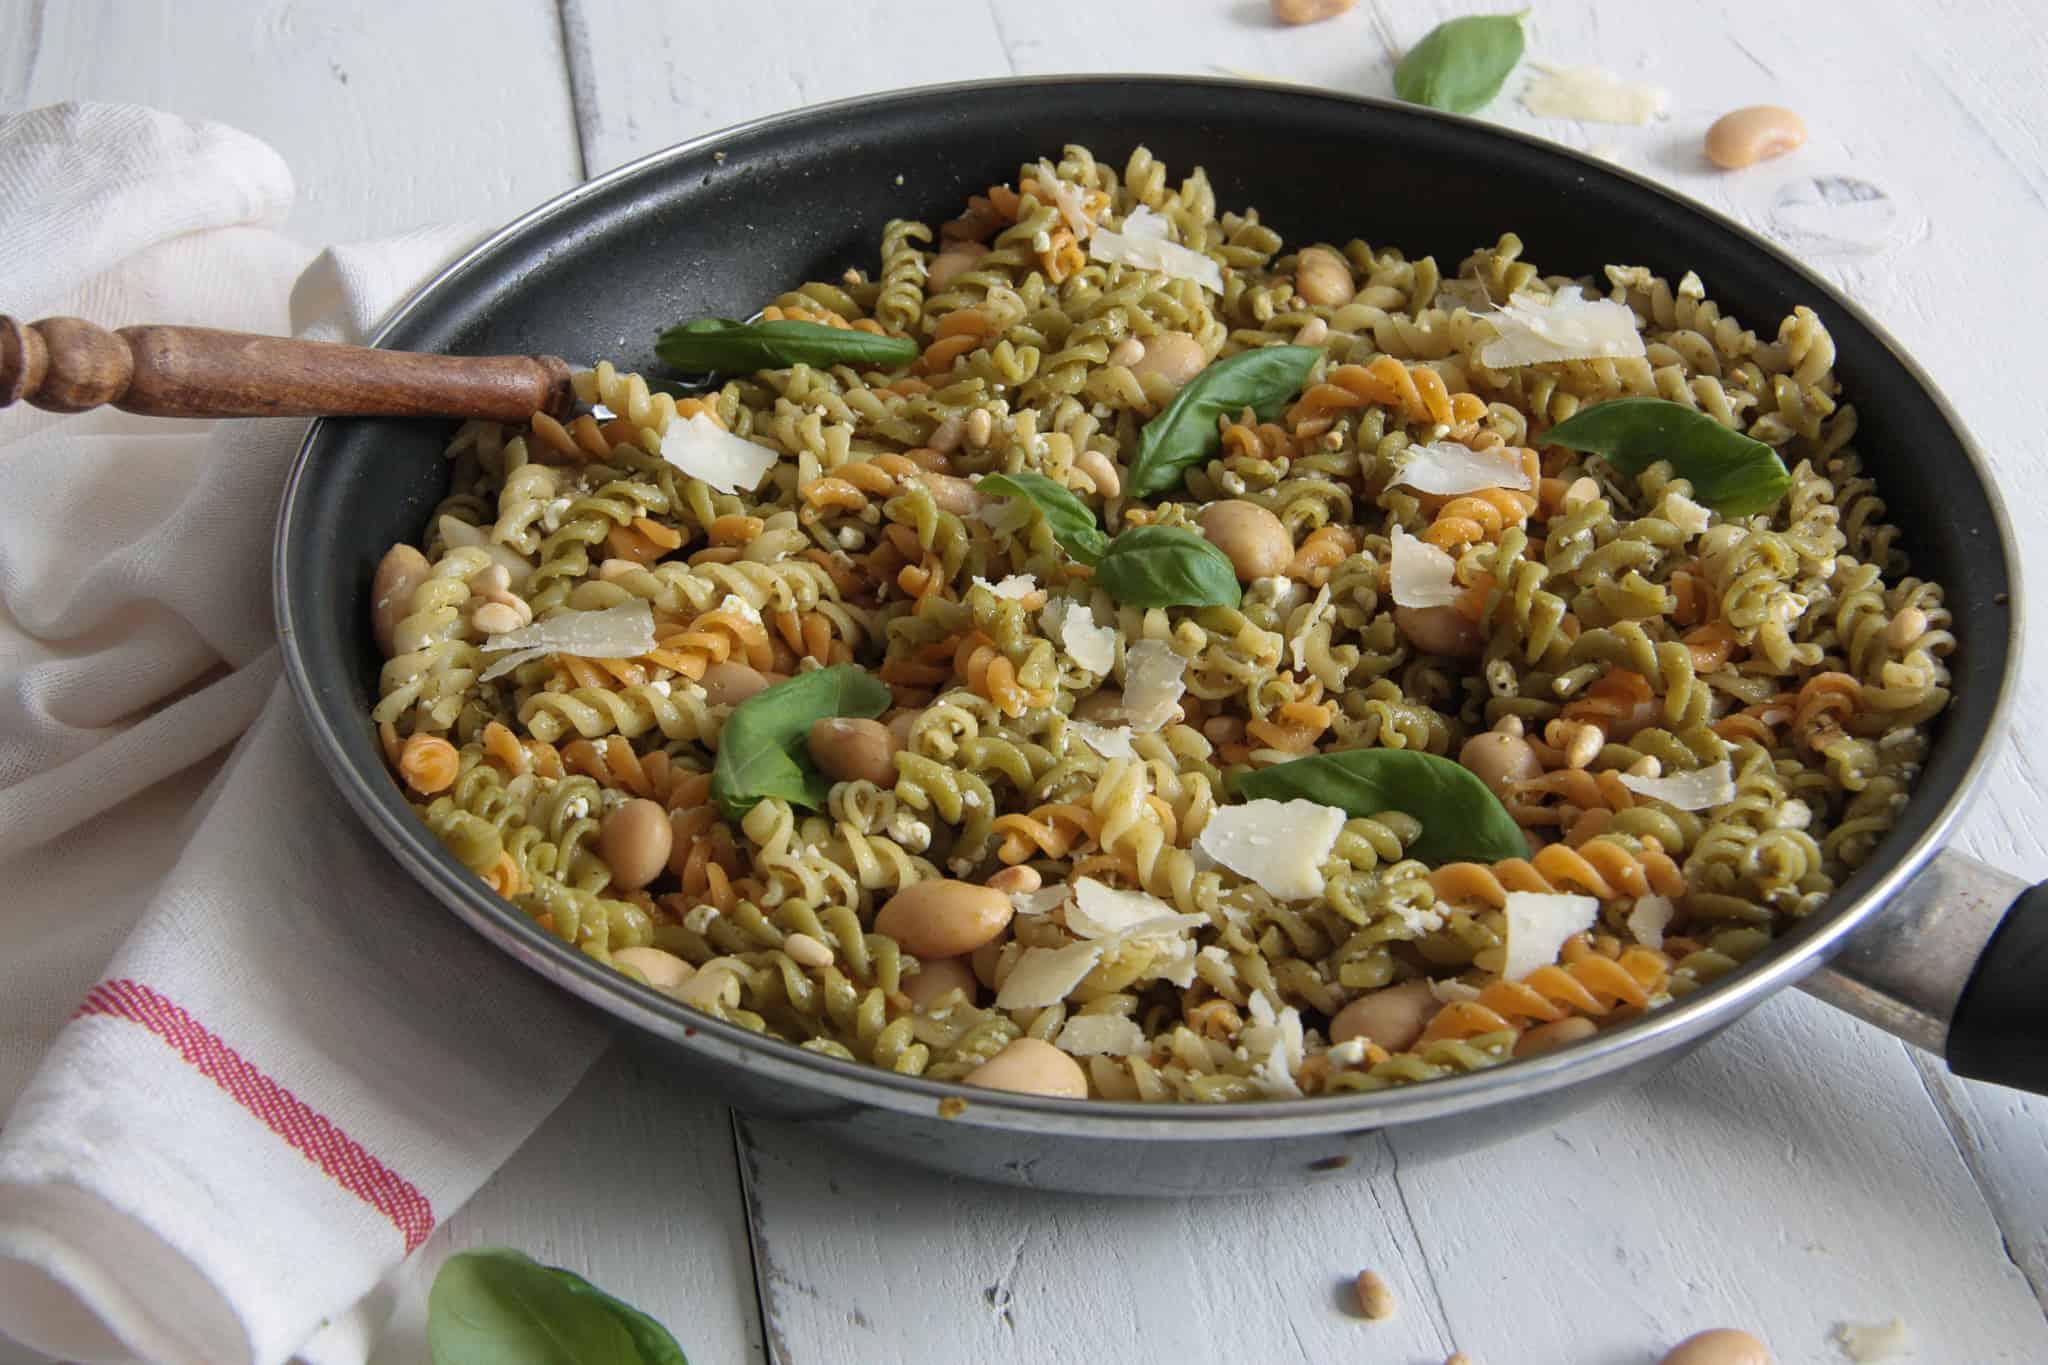 vegetarische pasta, pastarecept, fusilli, pesto, limabonen